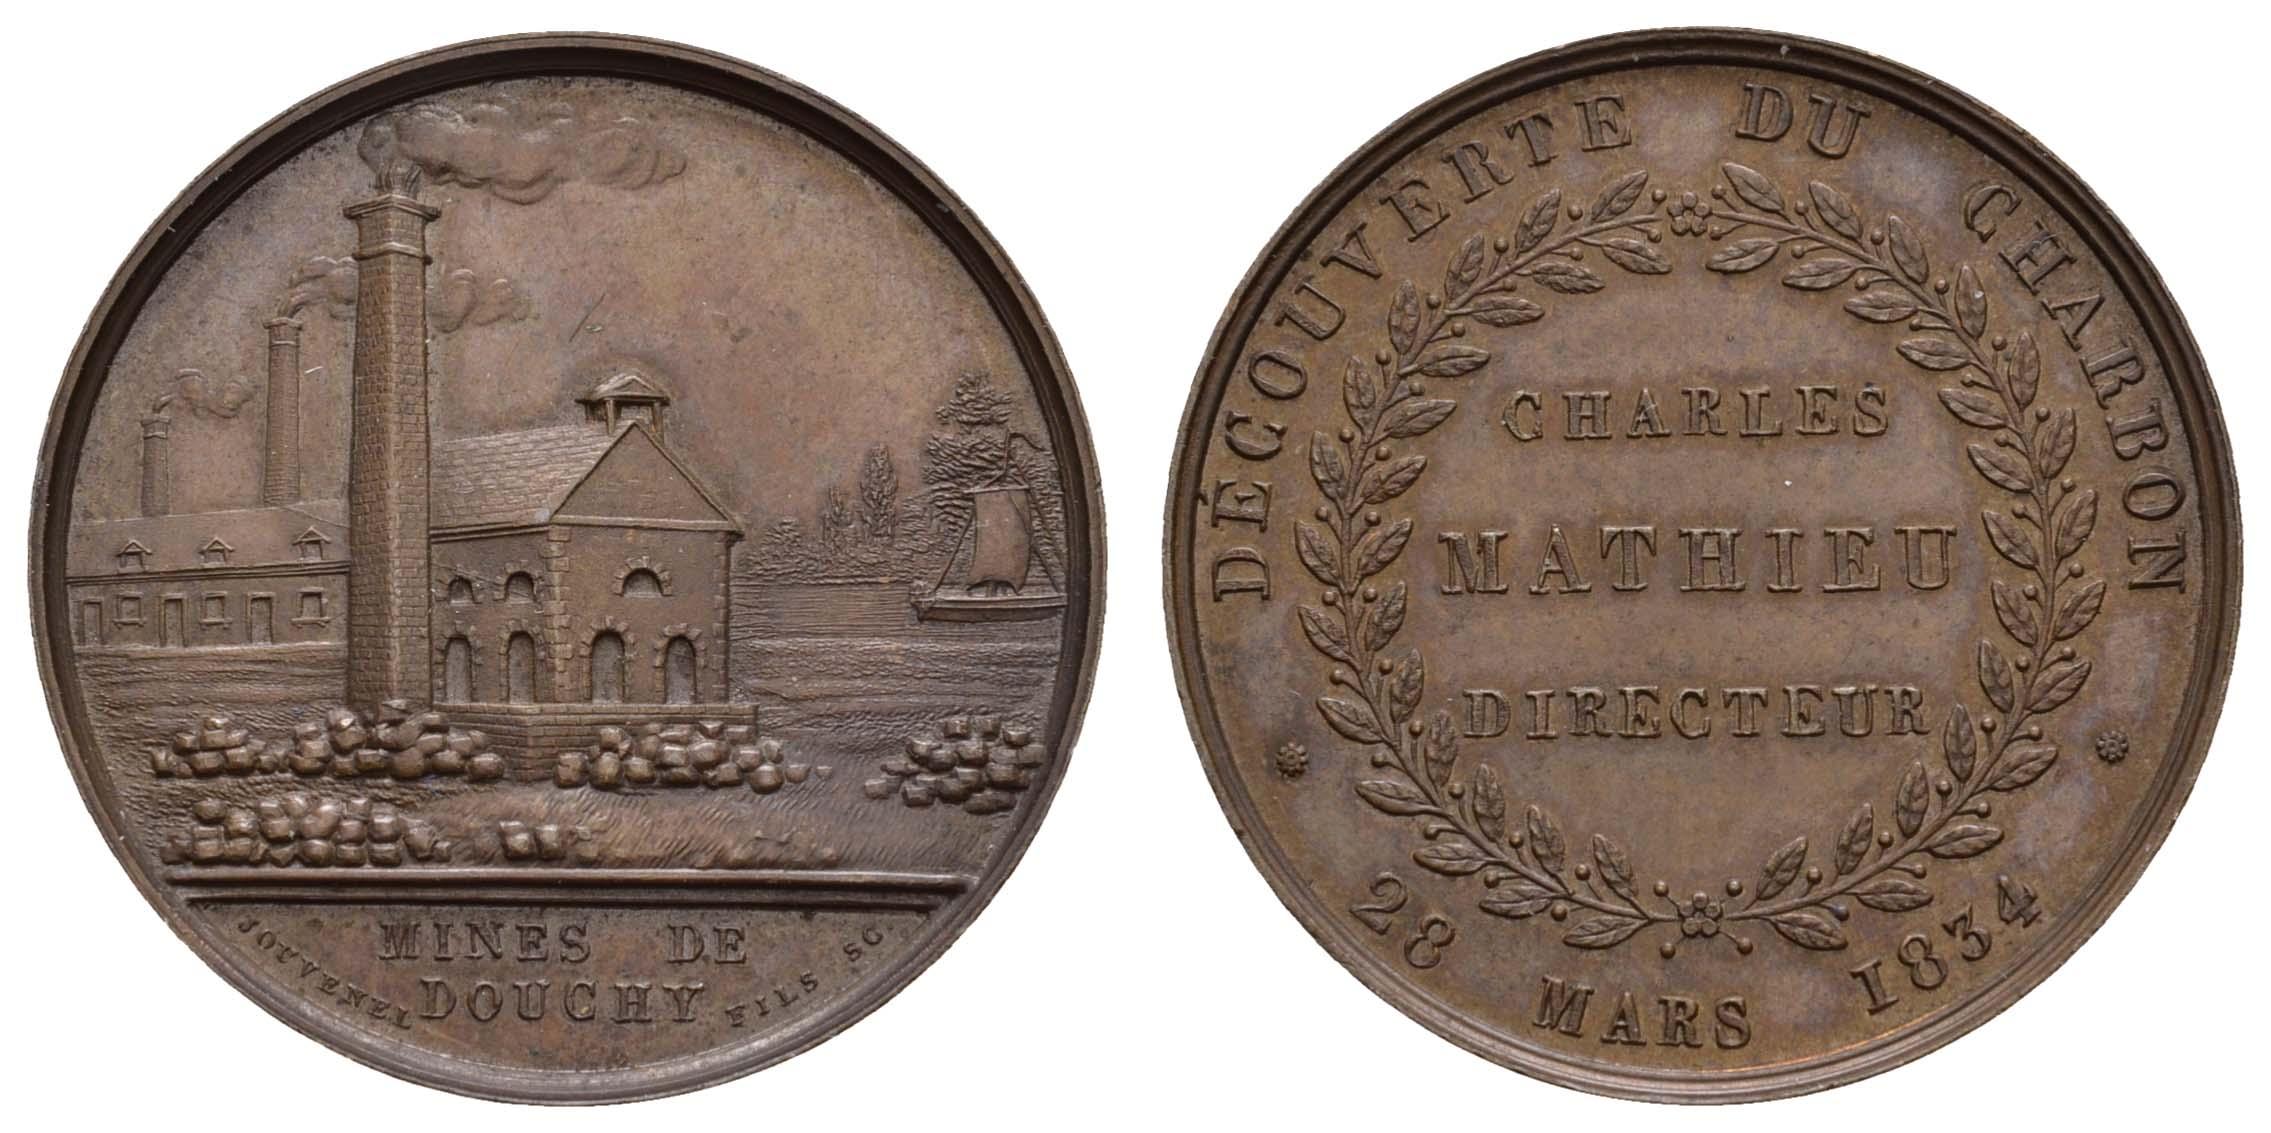 Lot 2268 - medaillen Sonstige Medaillen - Europa -  Auktionshaus Ulrich Felzmann GmbH & Co. KG Coins single lots